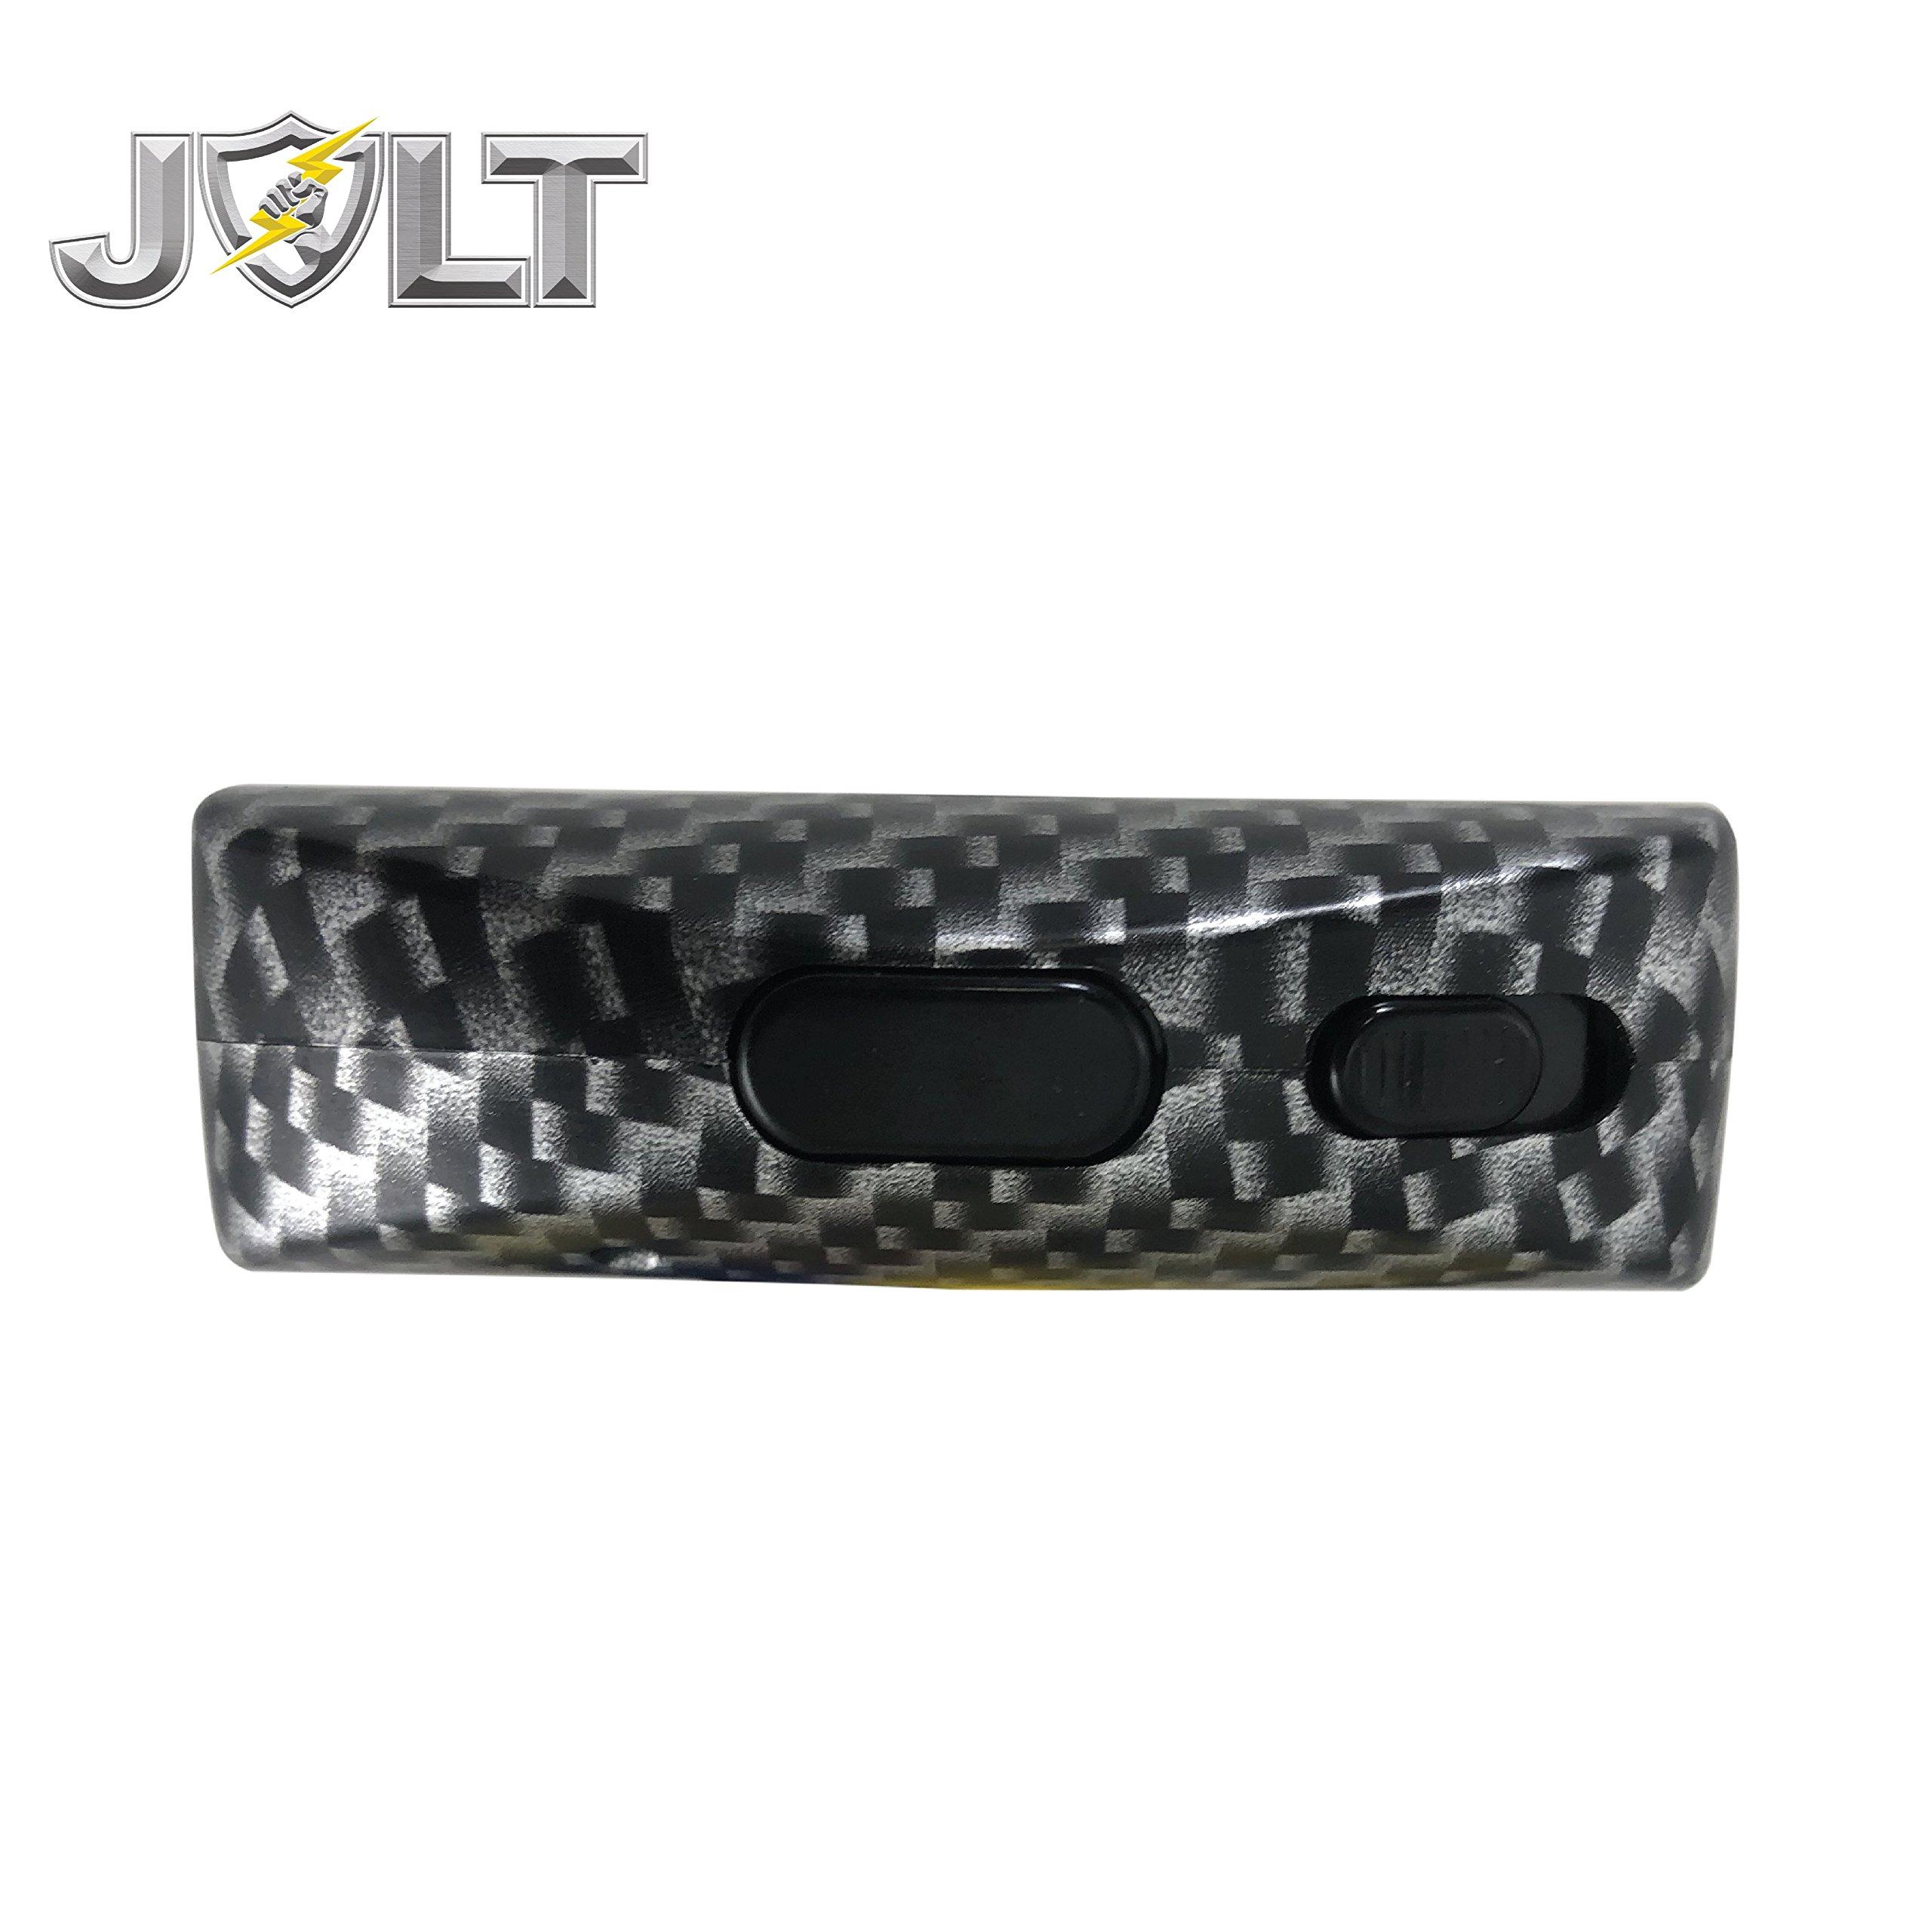 STREET WISE SECURITY PRODUCTS JOLT Protector 60,000,000 Stun Gun HD Carbon Fiber: Black